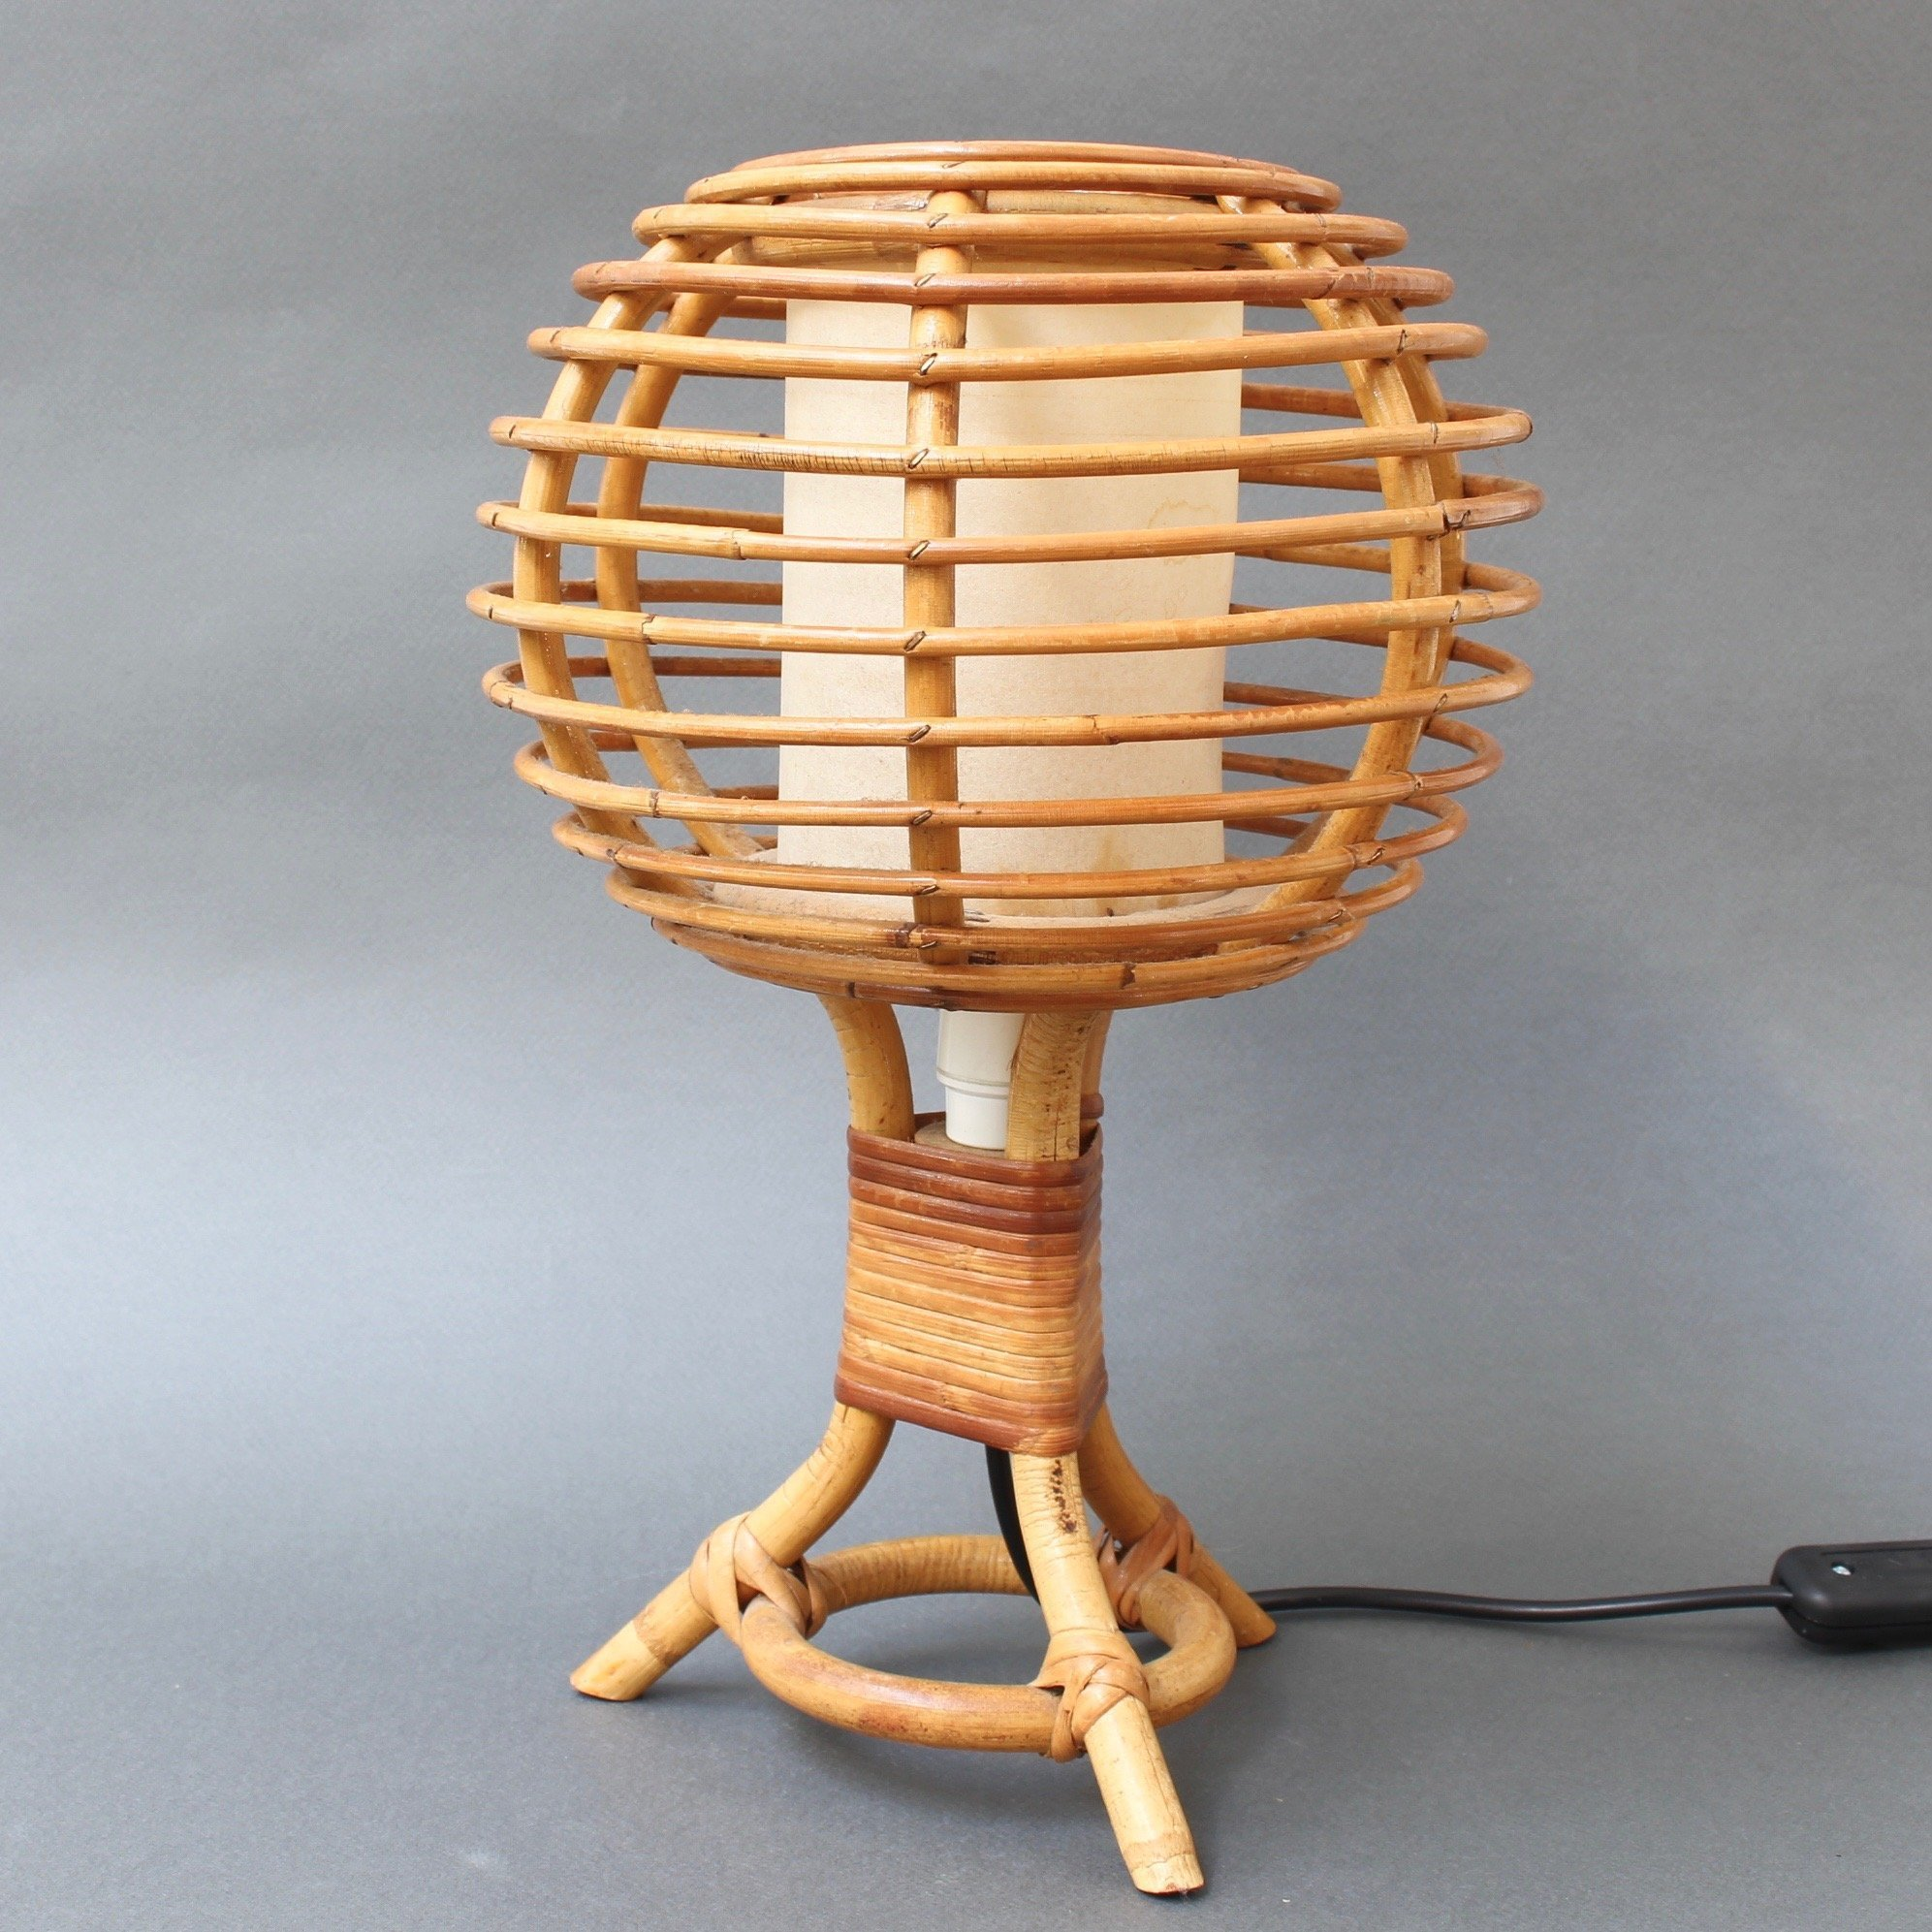 rattan boho bohemian lighting vintage table lamp